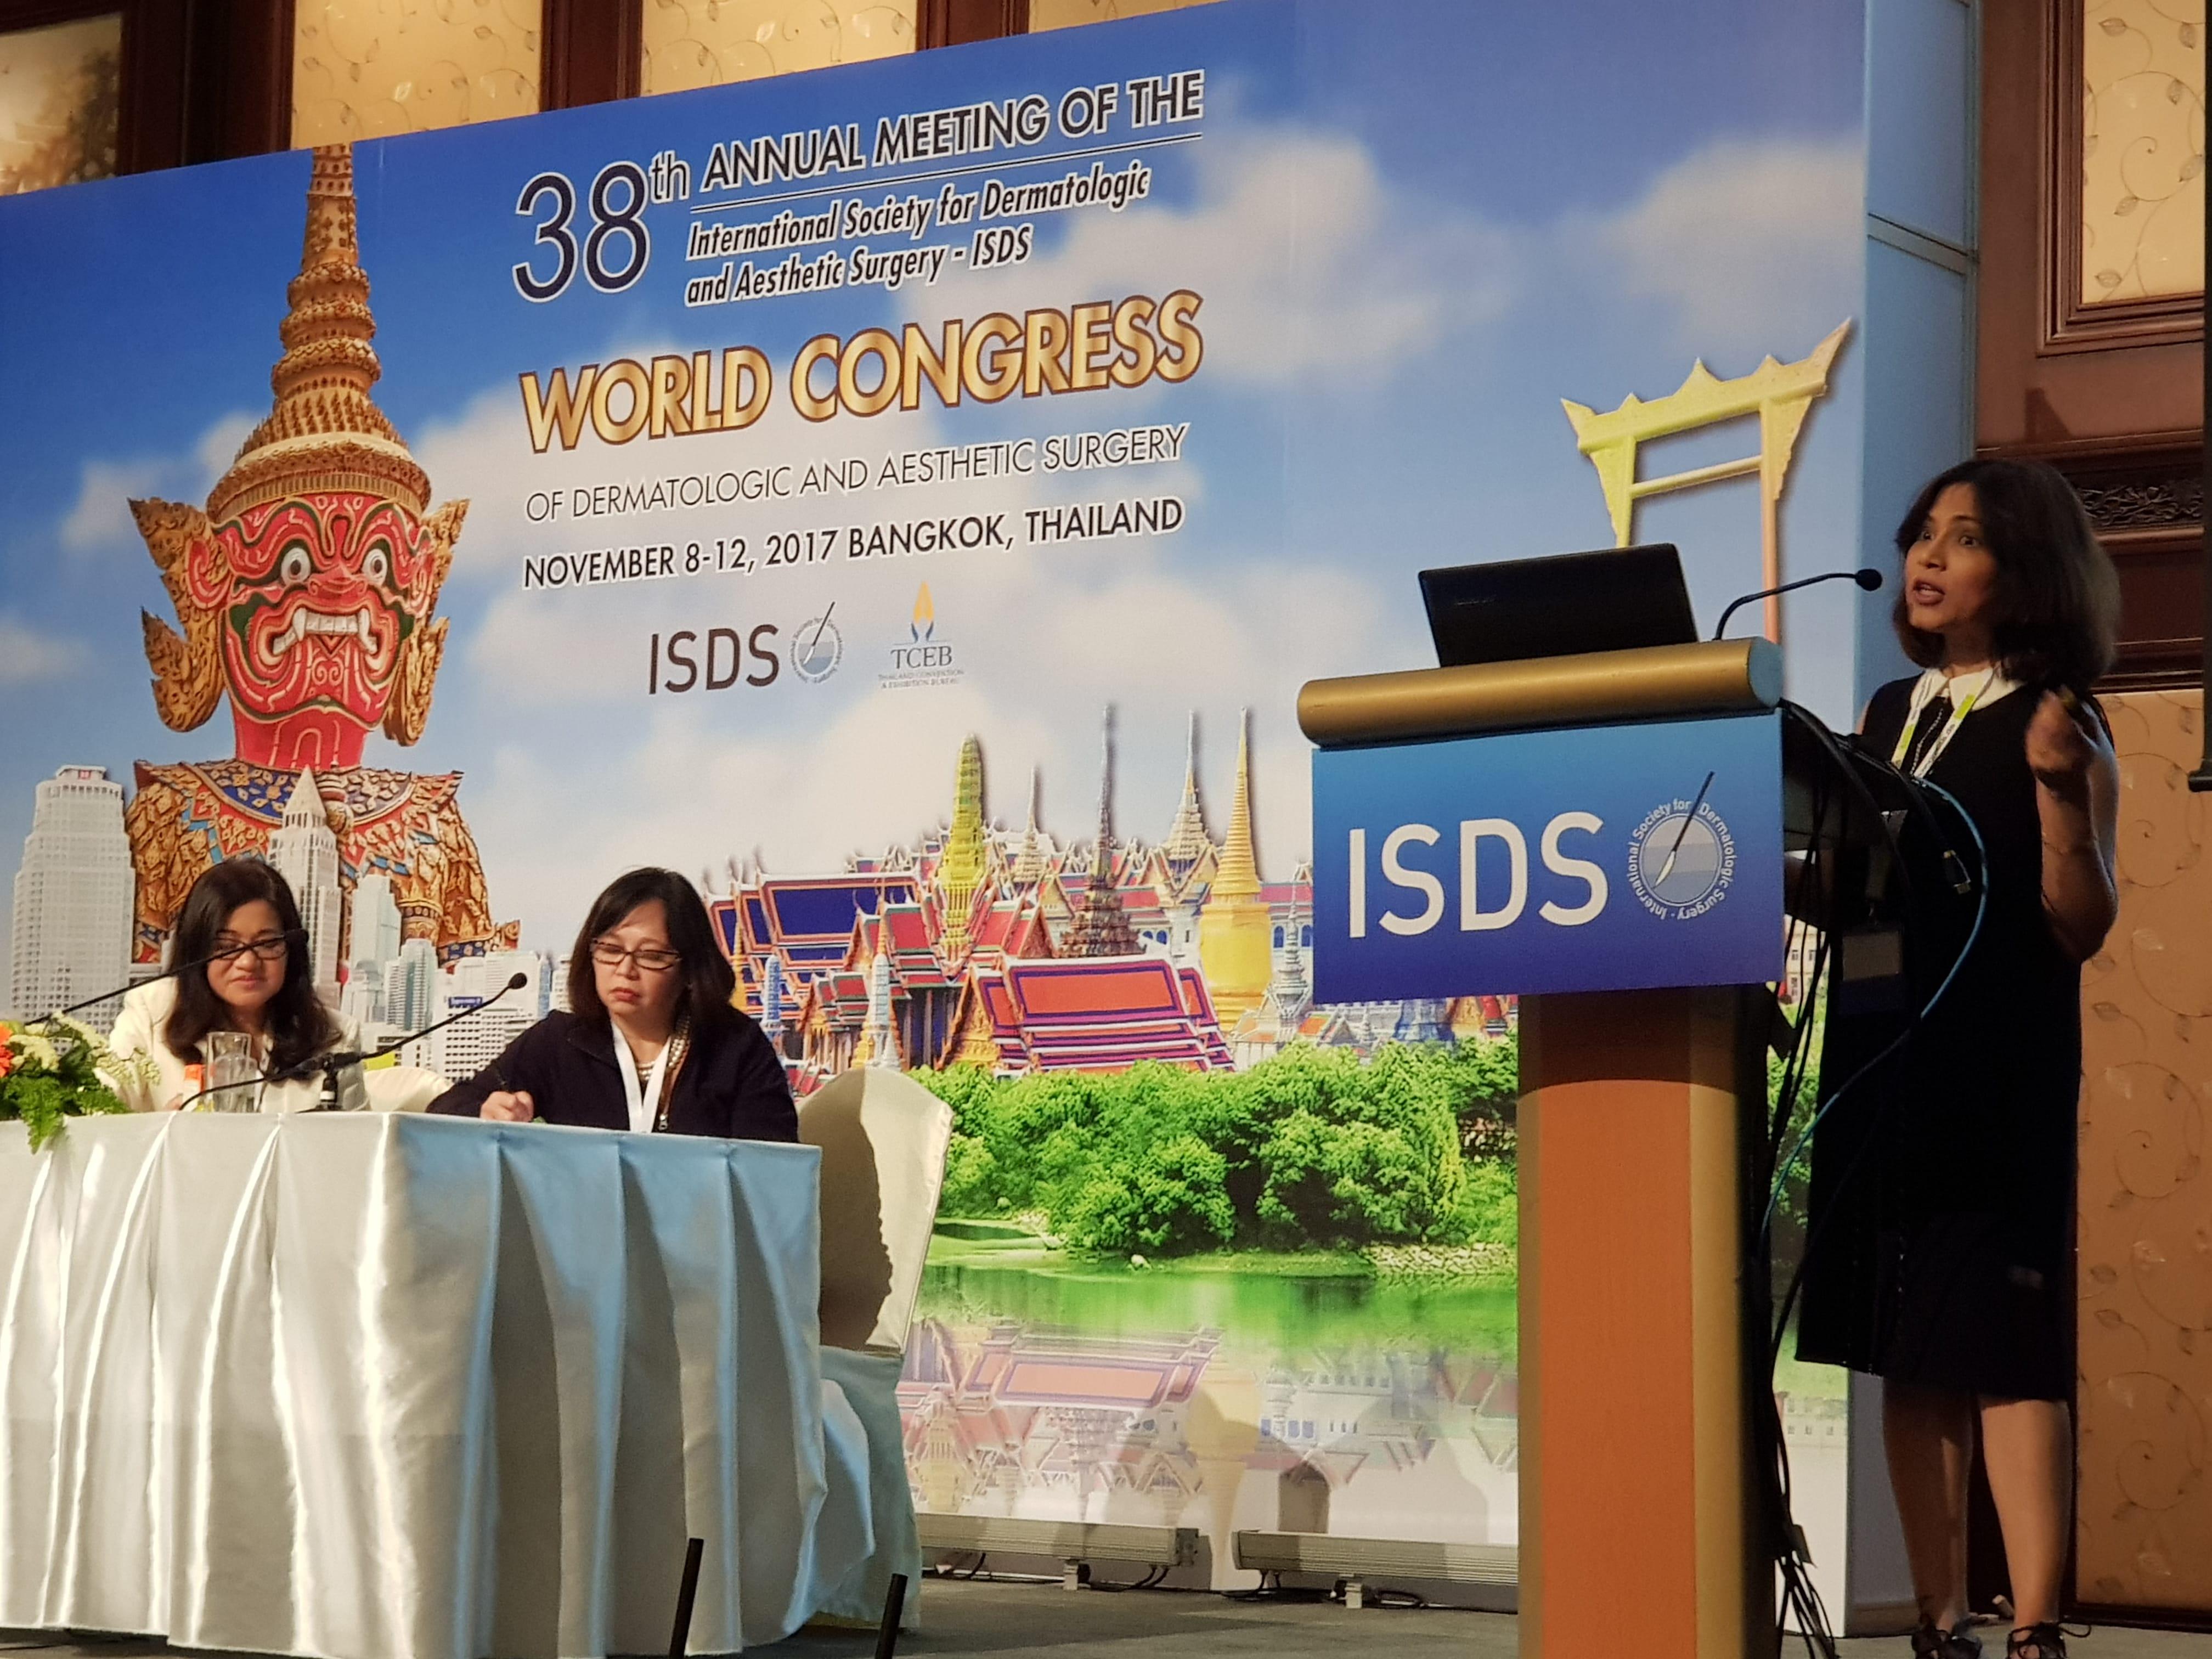 2017 -Bangkok World Congress of Dermatologic & Aesthetic Surgery